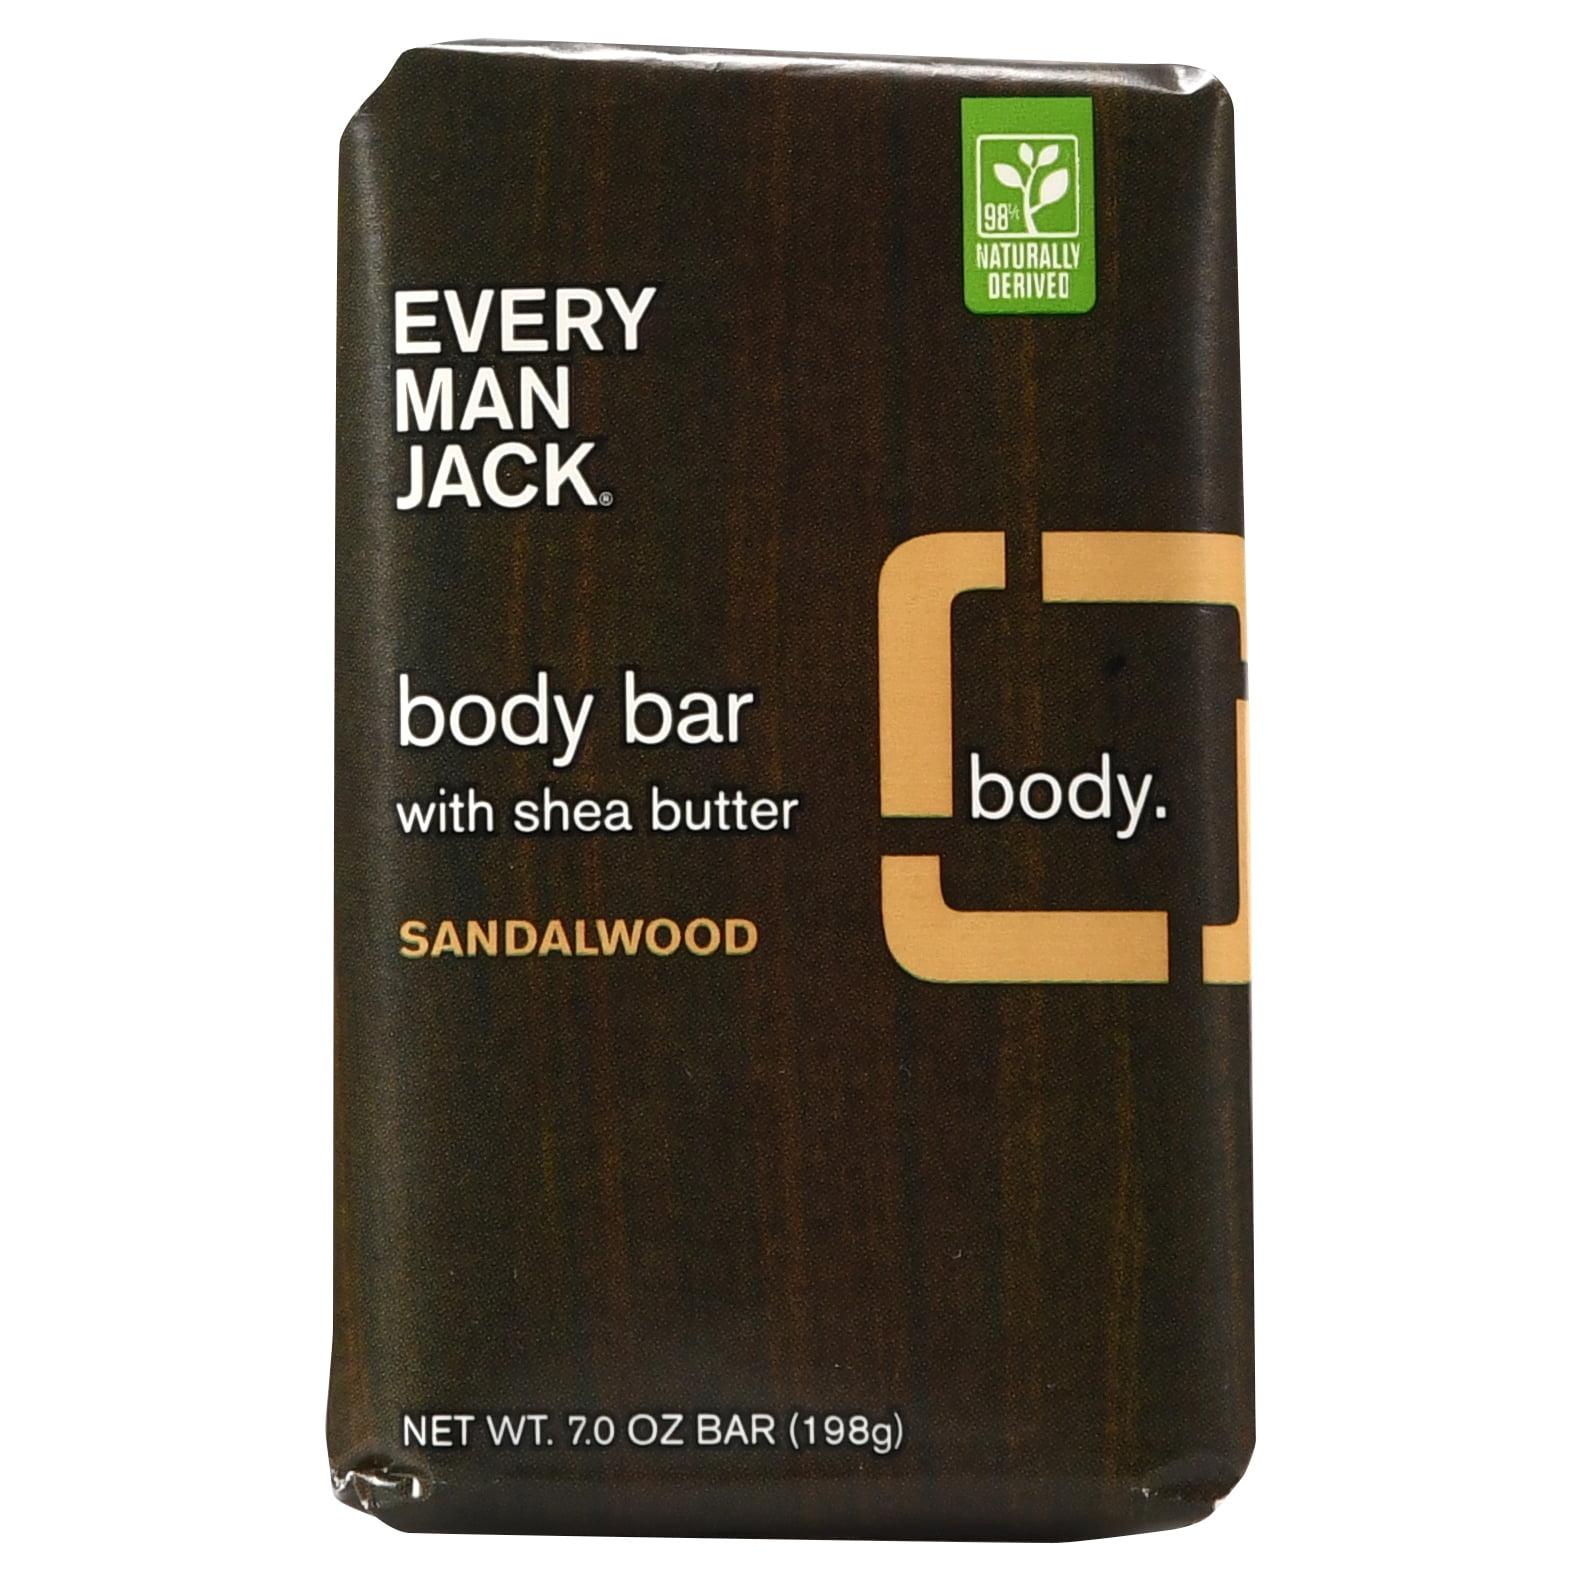 Every Man Jack Sandalwood Body Bar with Shea Butter, 7.0 oz